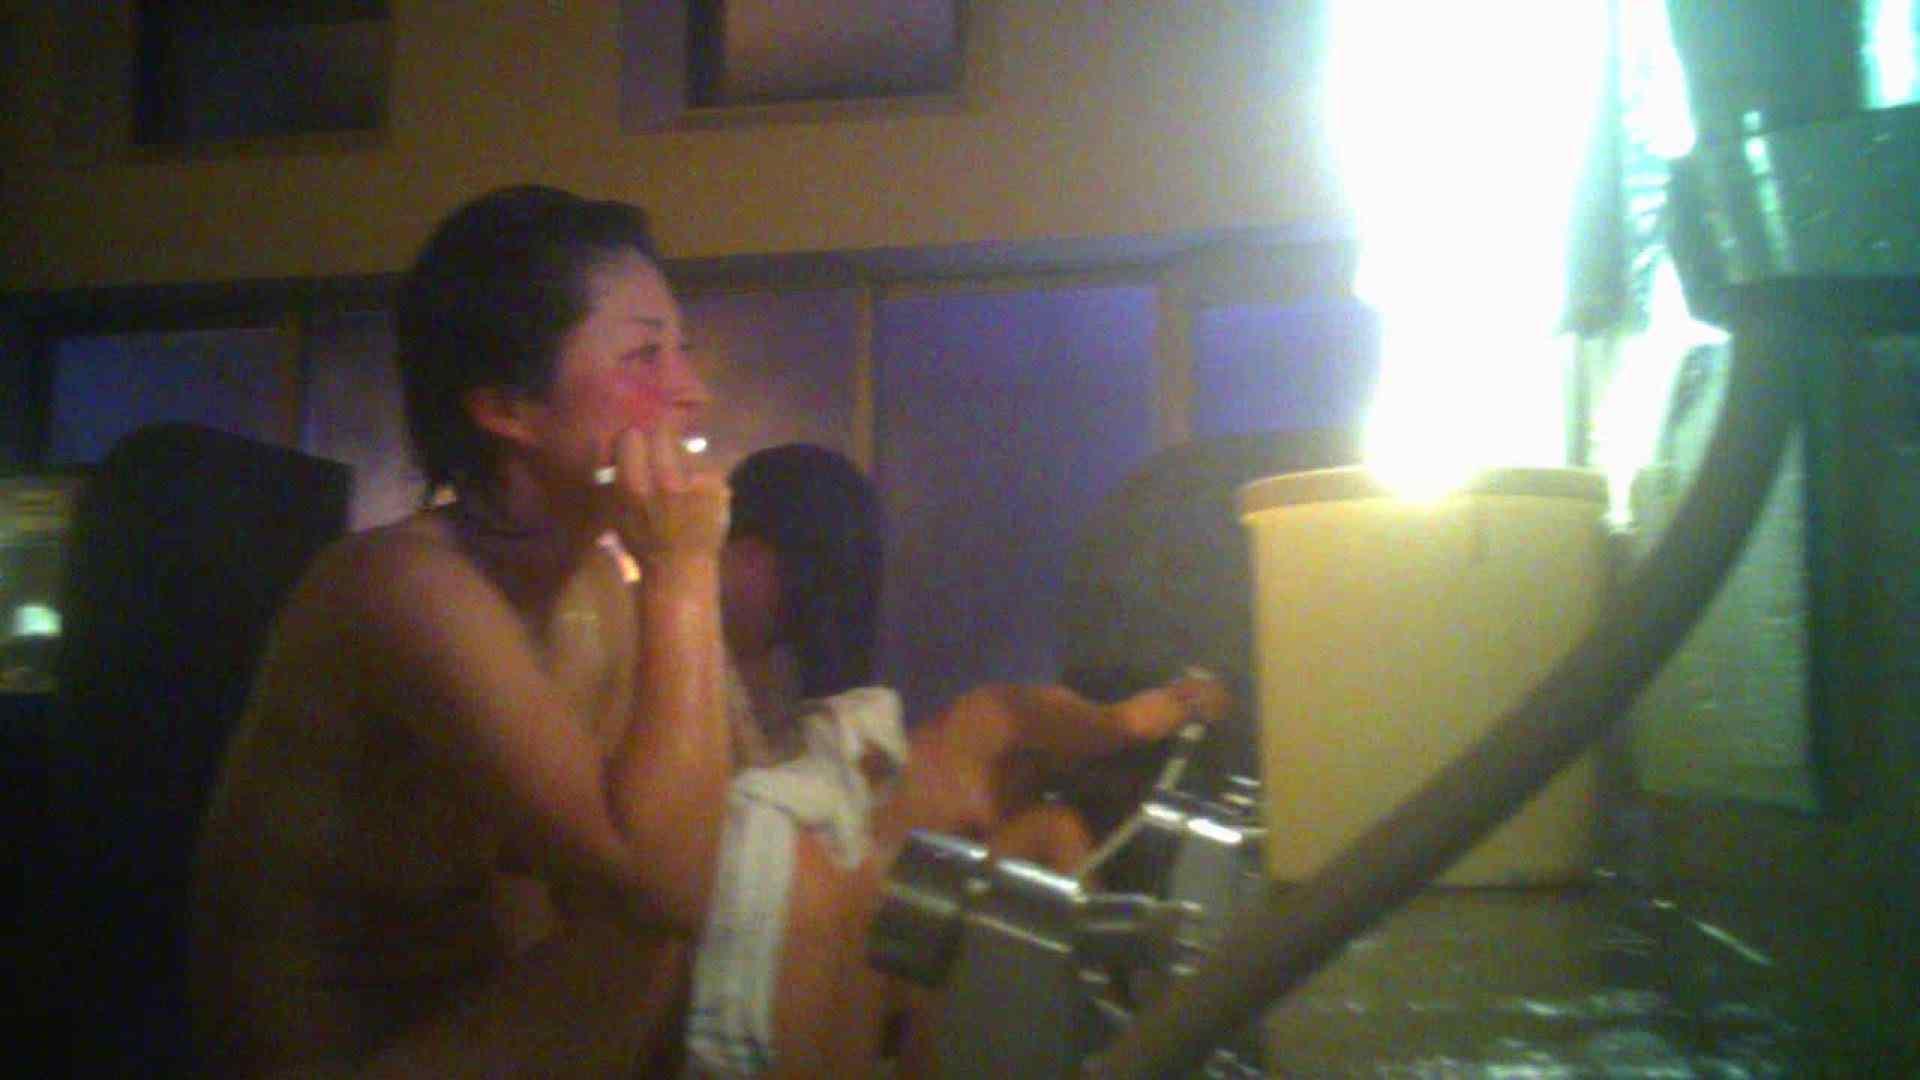 TG.21 【上等兵】井戸端会議が大好きな奥さん 垂れ乳 アダルト動画キャプチャ 81画像 14